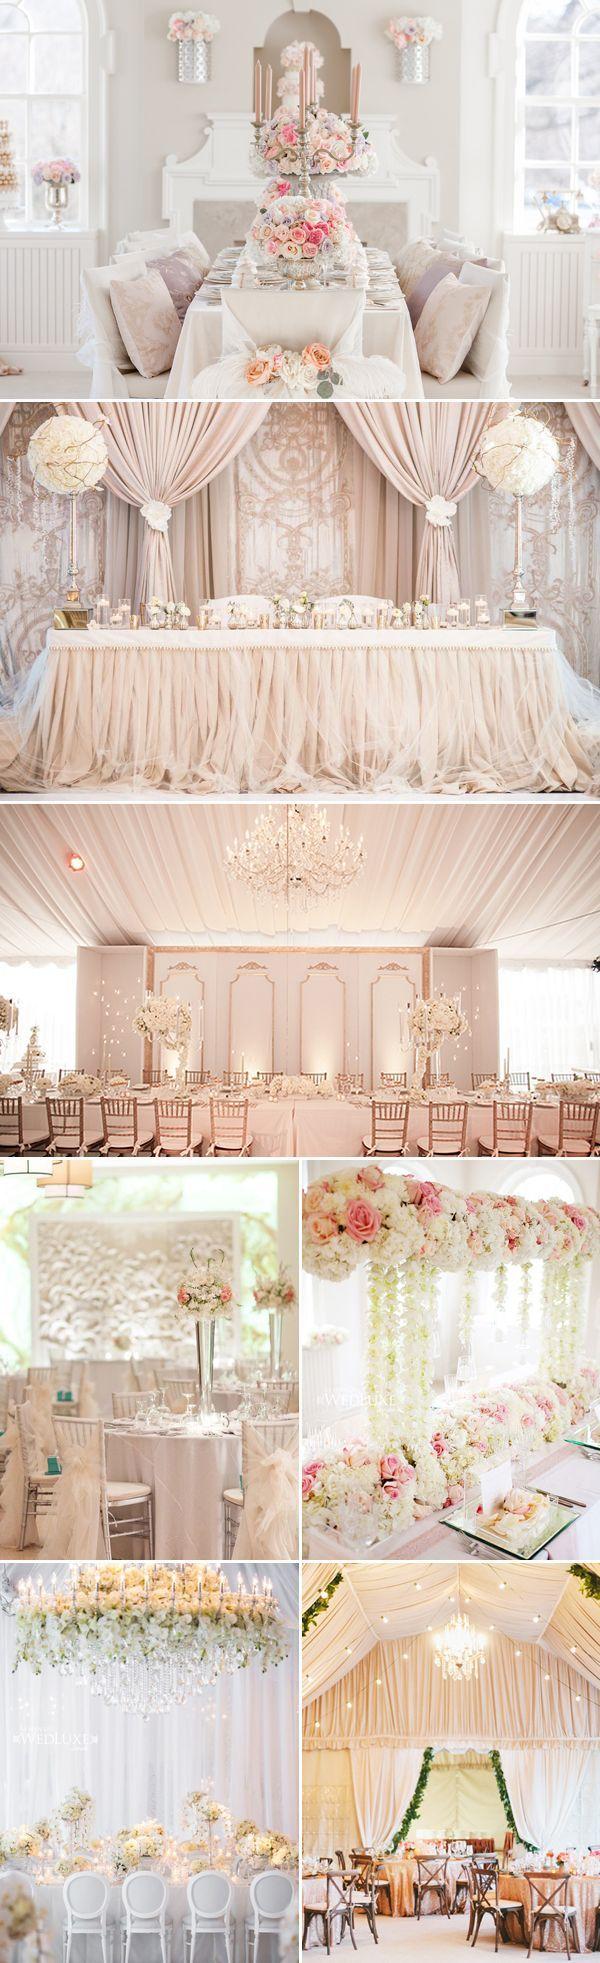 stunning luxury indoor reception decoration ideas you don   want to miss also this weeks elegant outdoor wedding decorations minimalist rh pinterest